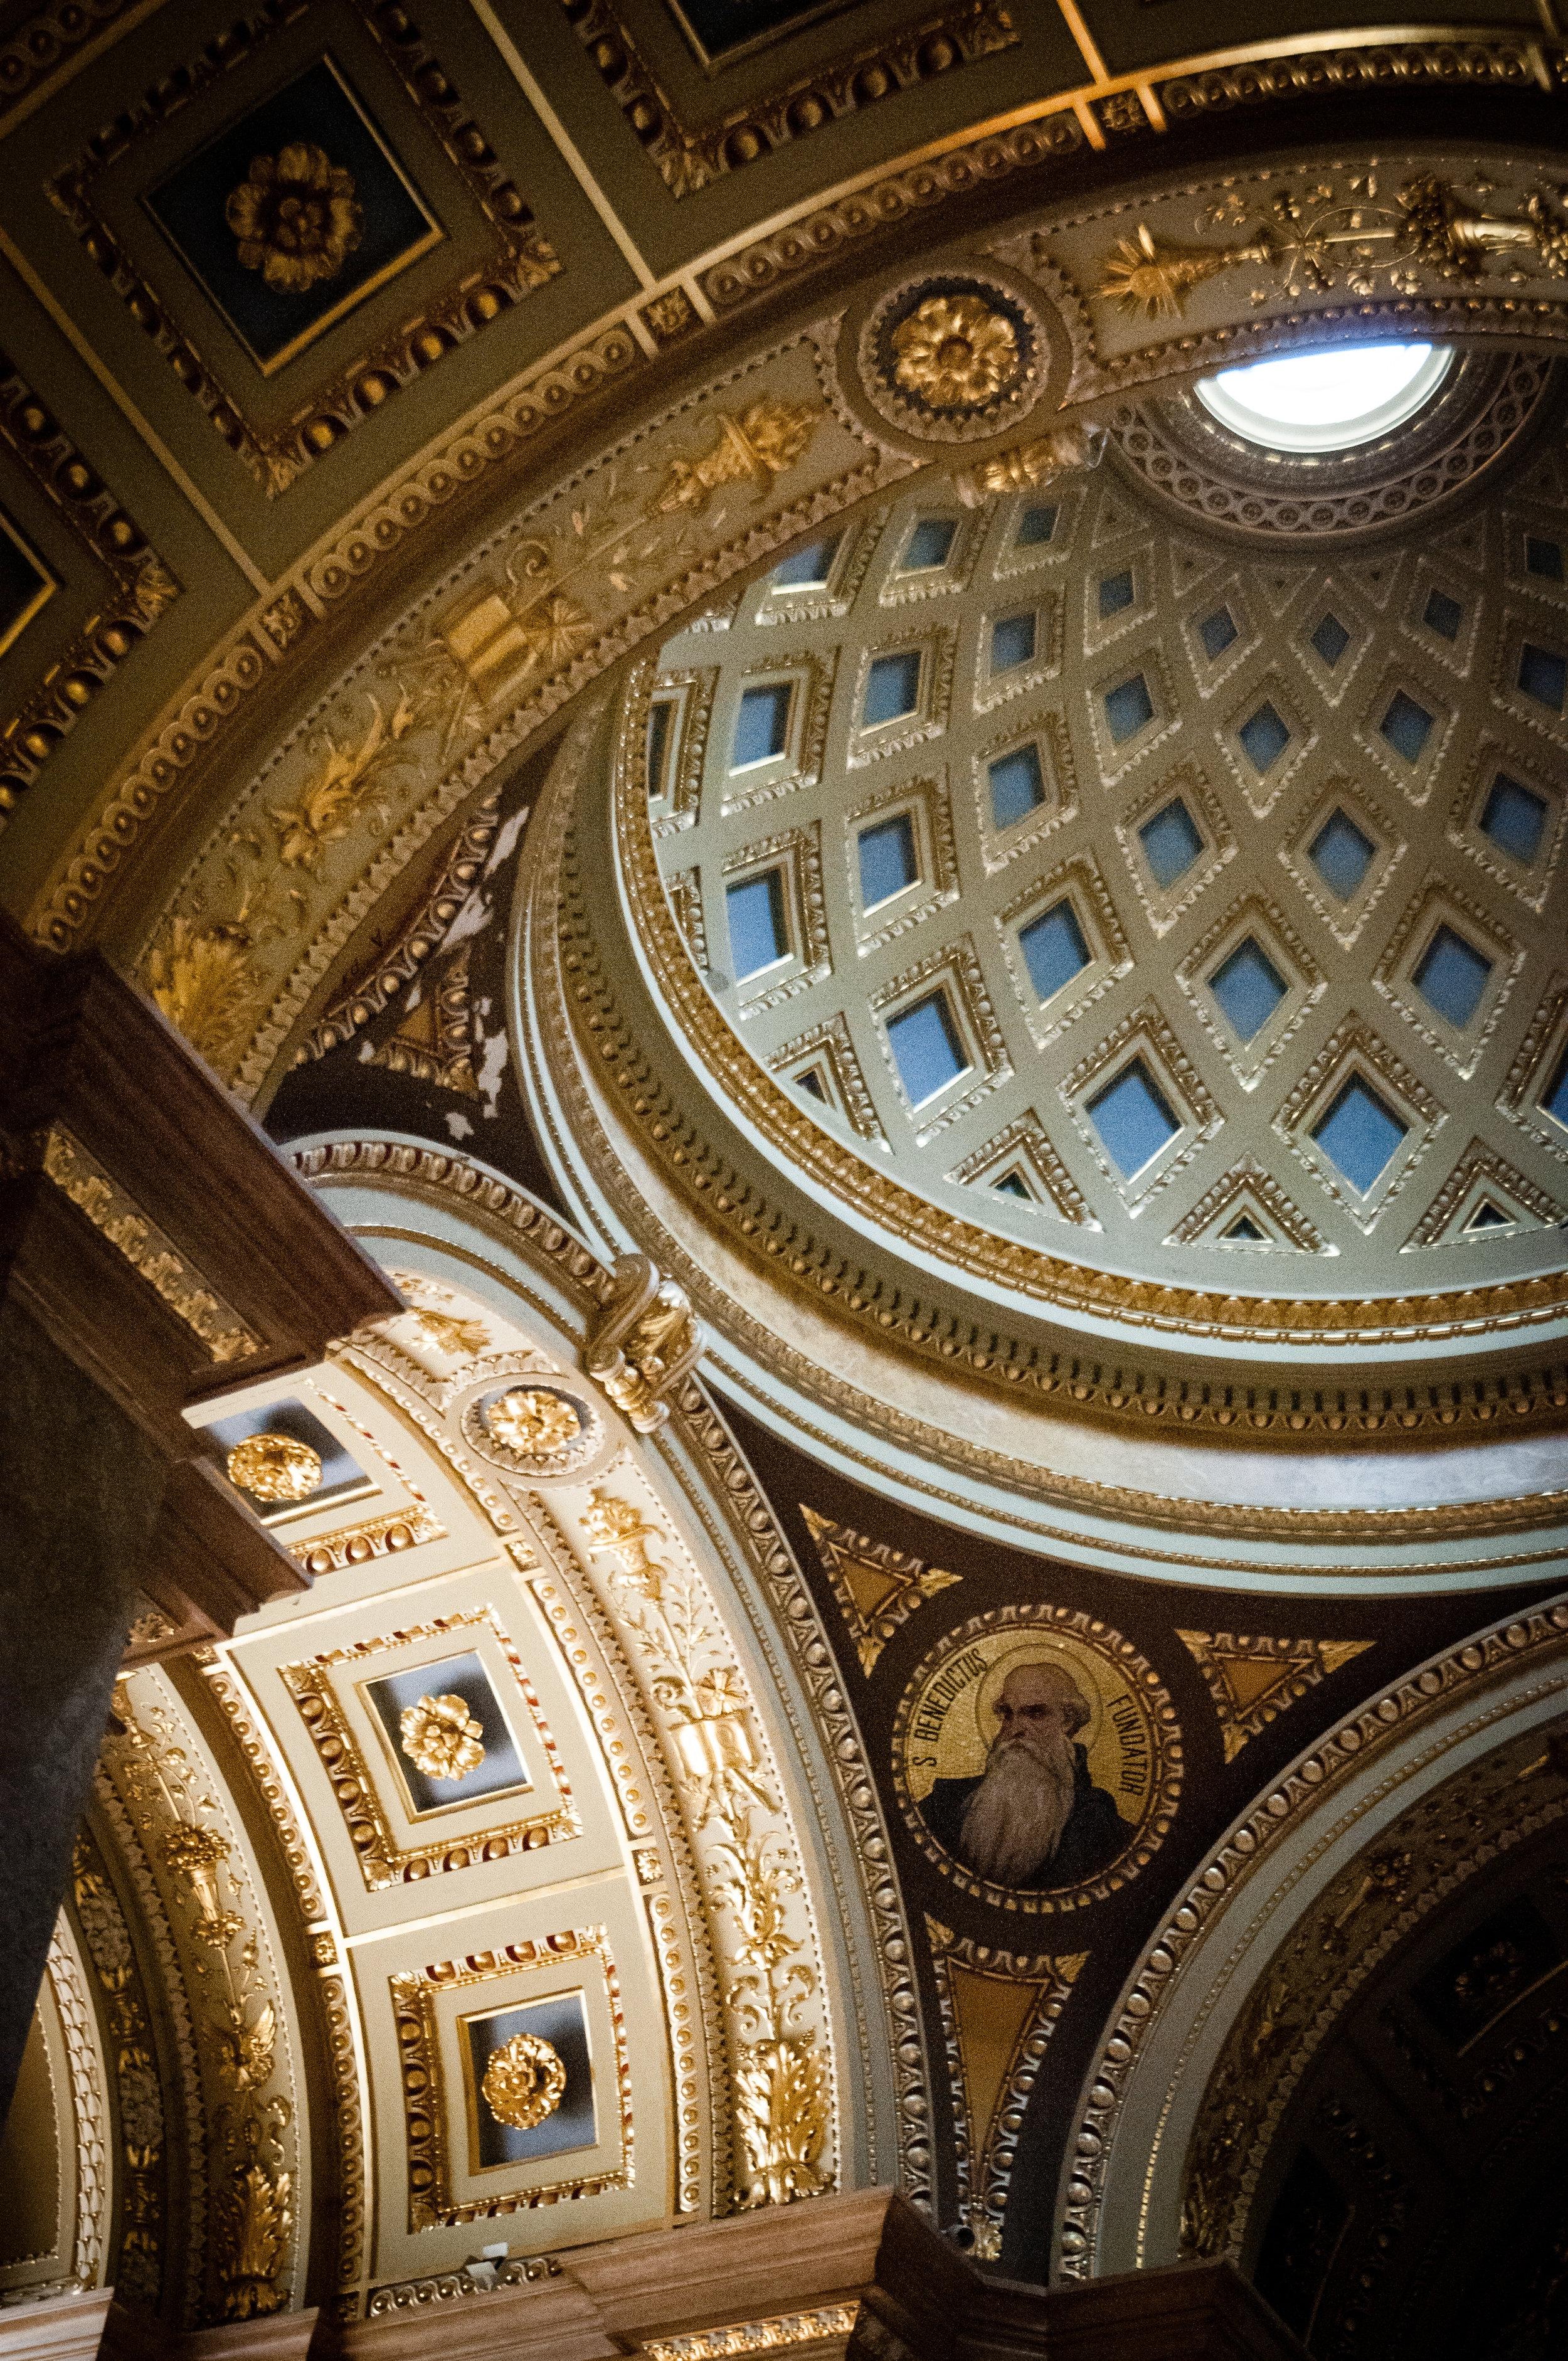 Interior Details, St. Stephen's Basilica, Budapest